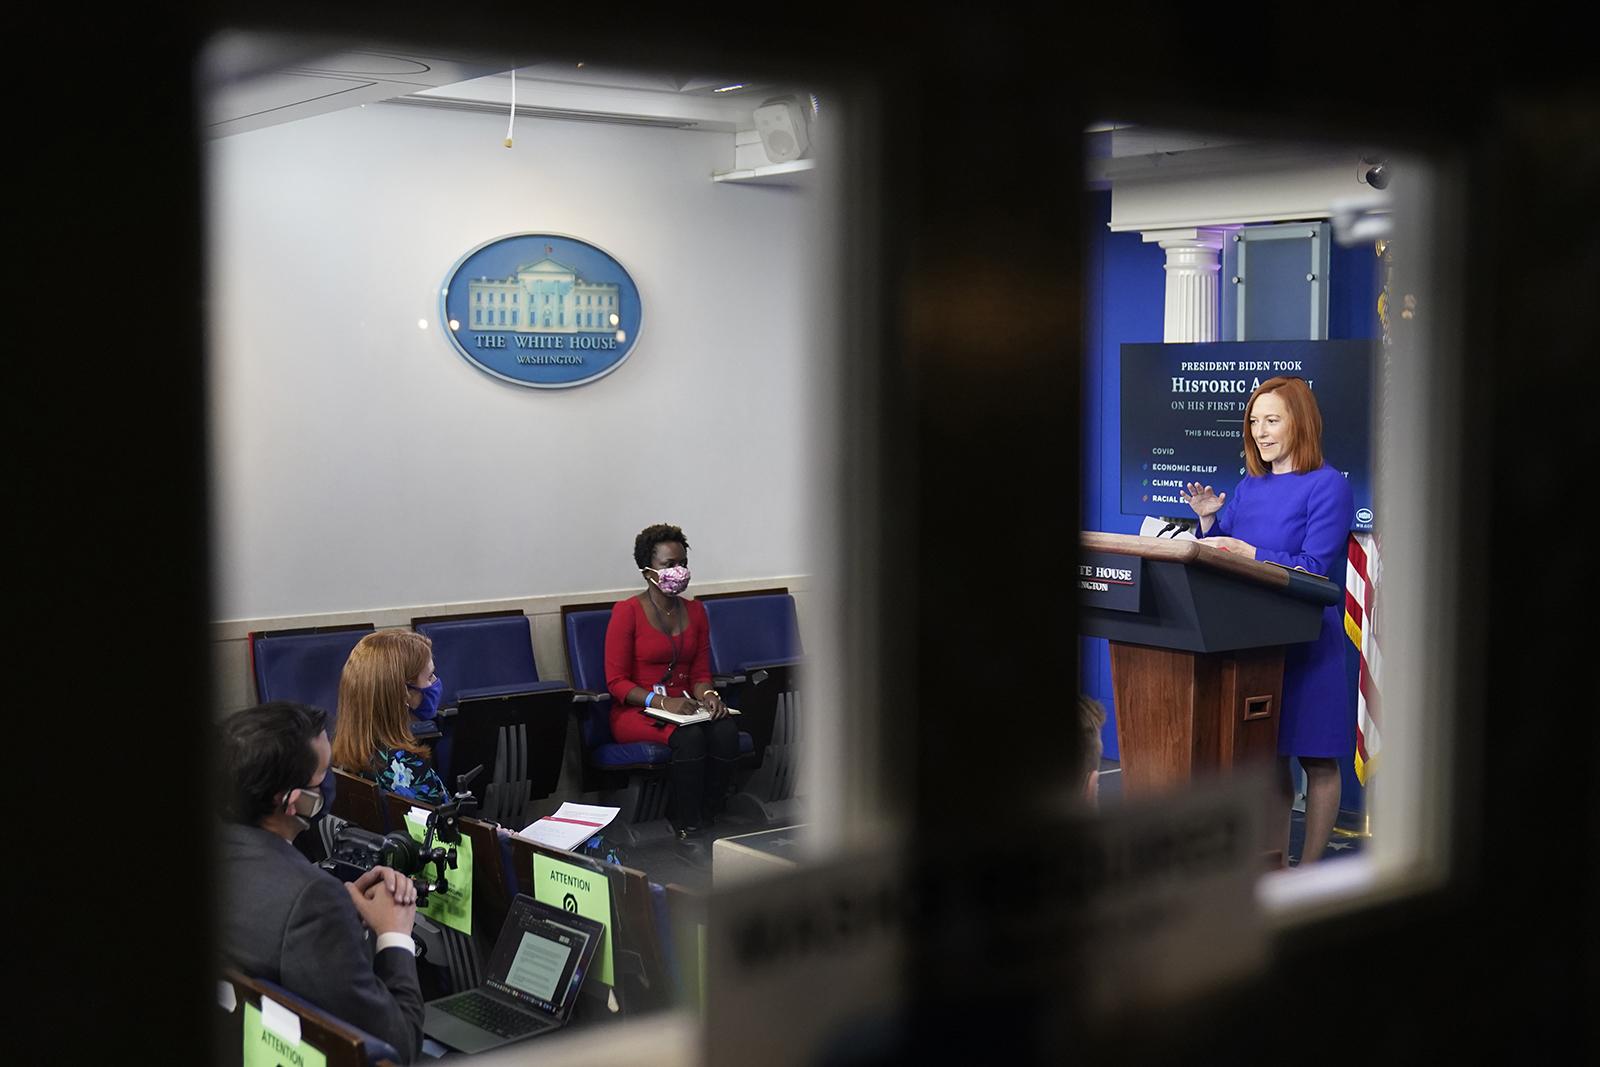 White House press secretary Jen Psaki speaks with reporters in the James Brady Press Briefing Room at the White House on January 20, i, Jan. 20, 2021, in Washington. (AP Photo/Alex Brandon)